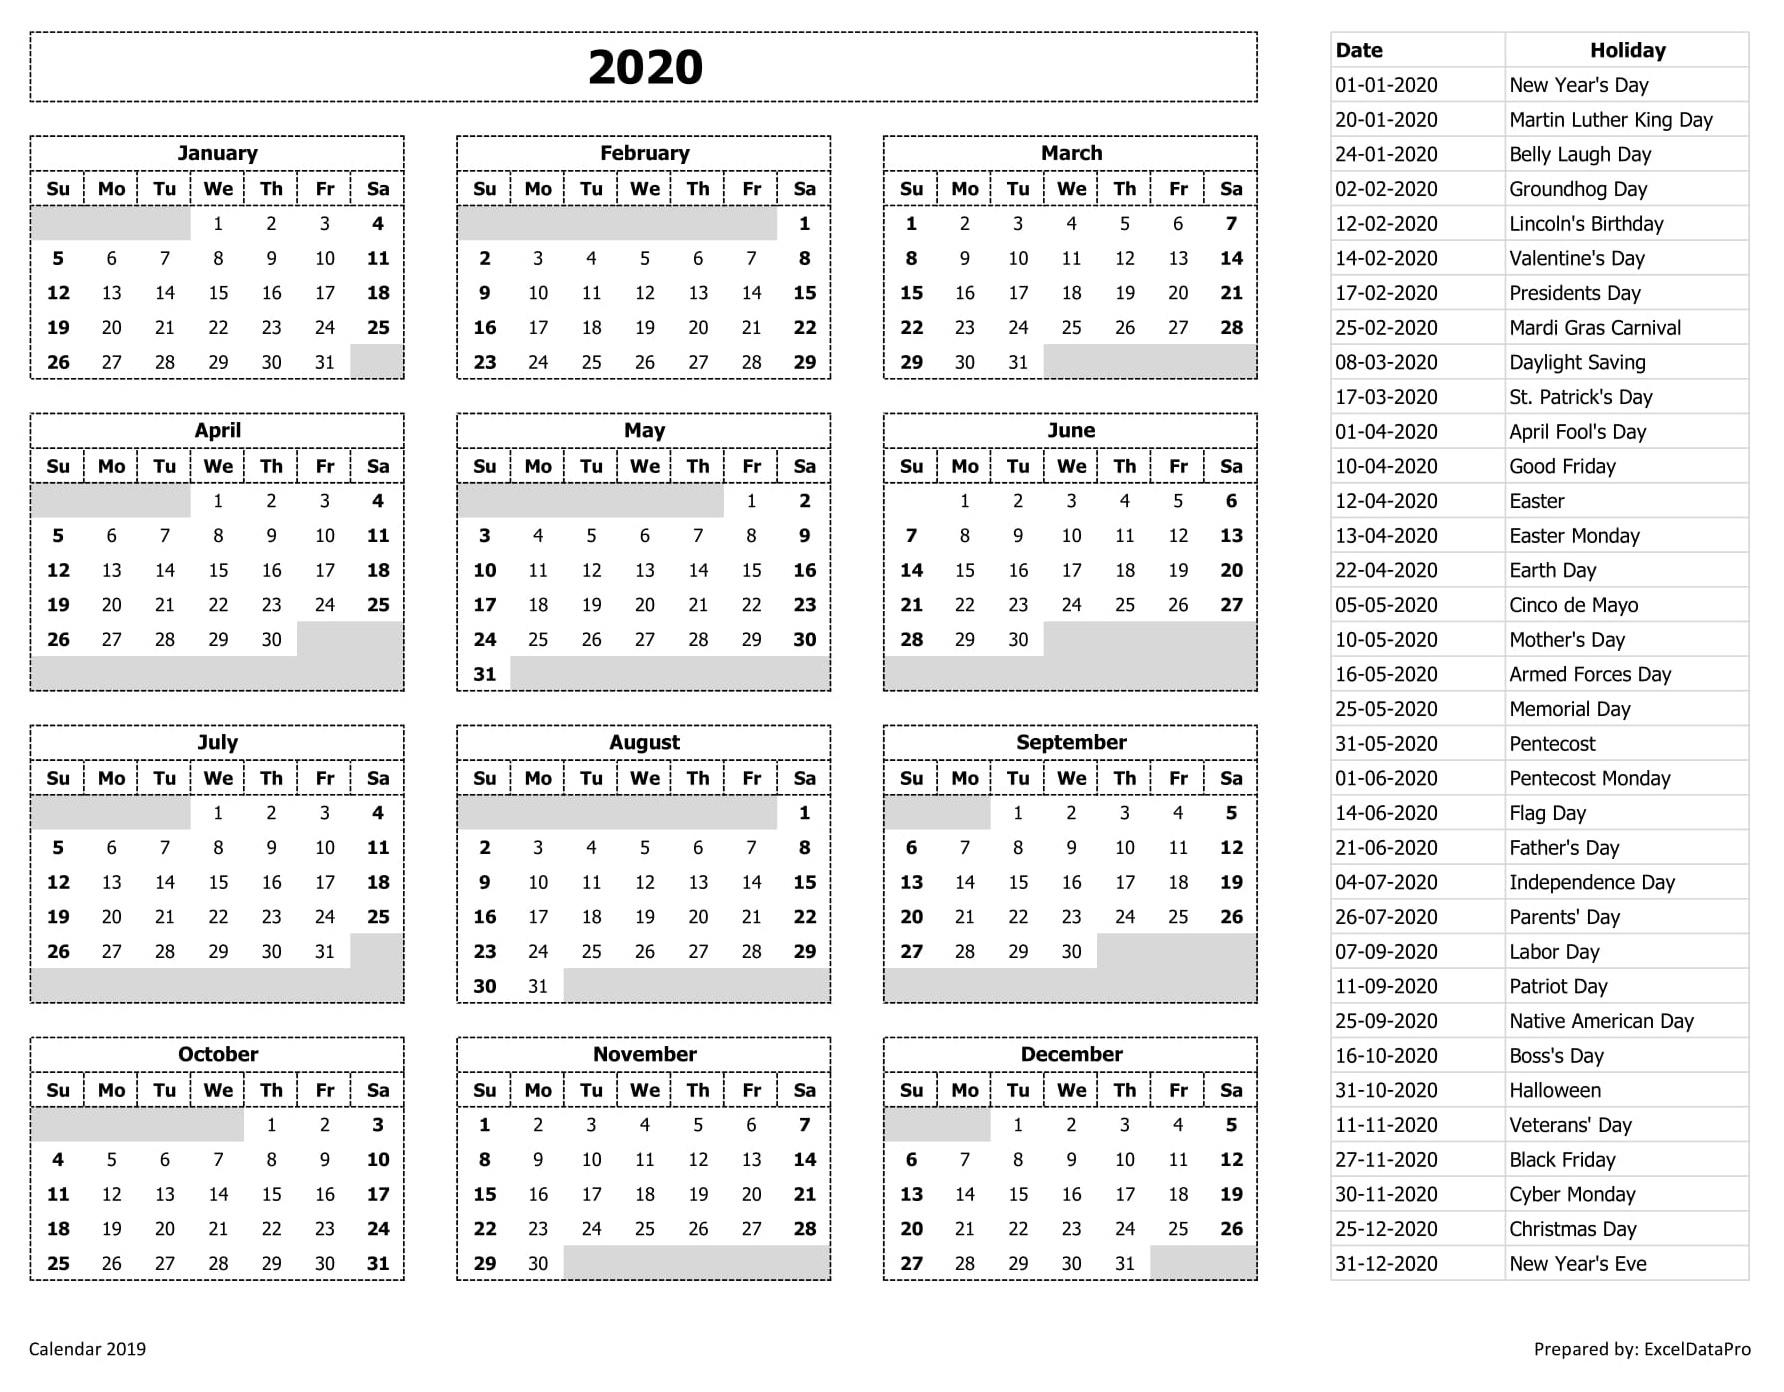 2020 Calendar Festival List